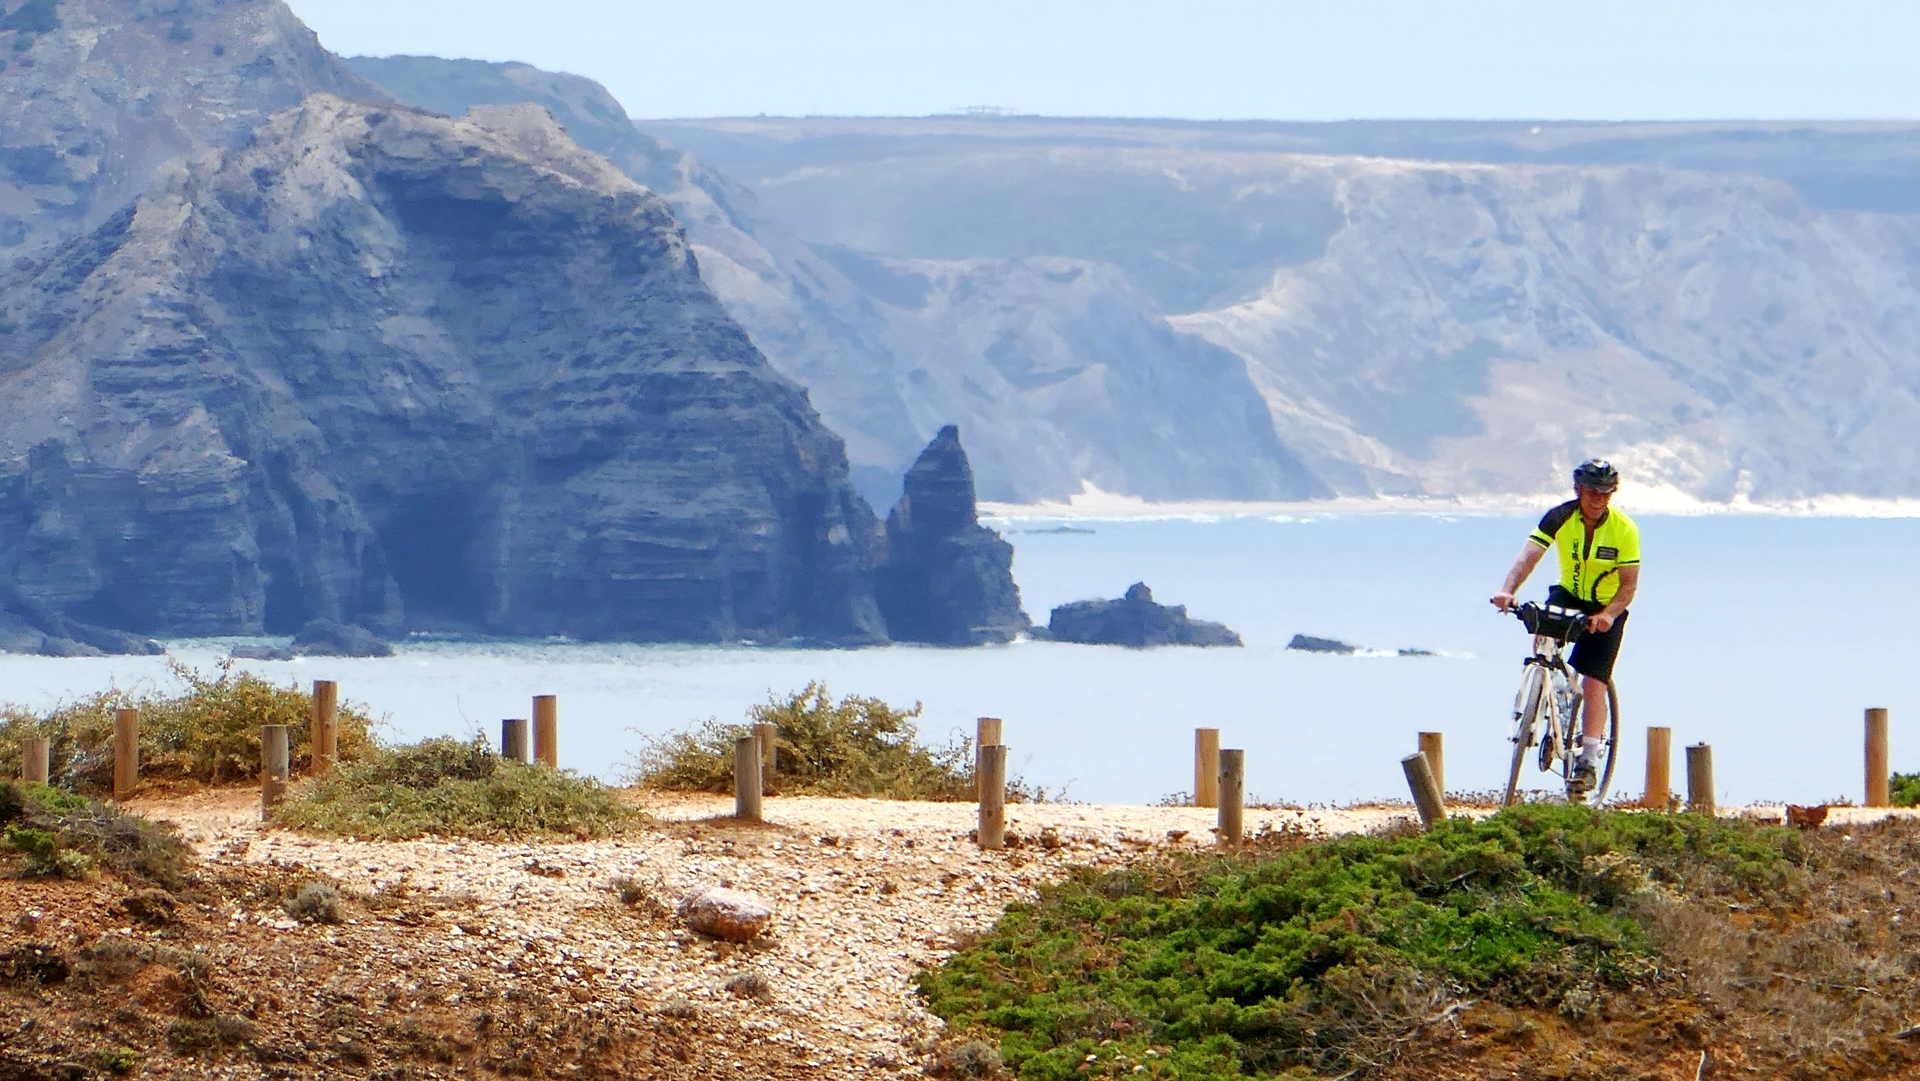 Bike Tour in Portugal, Biking in Portugal Alentejo